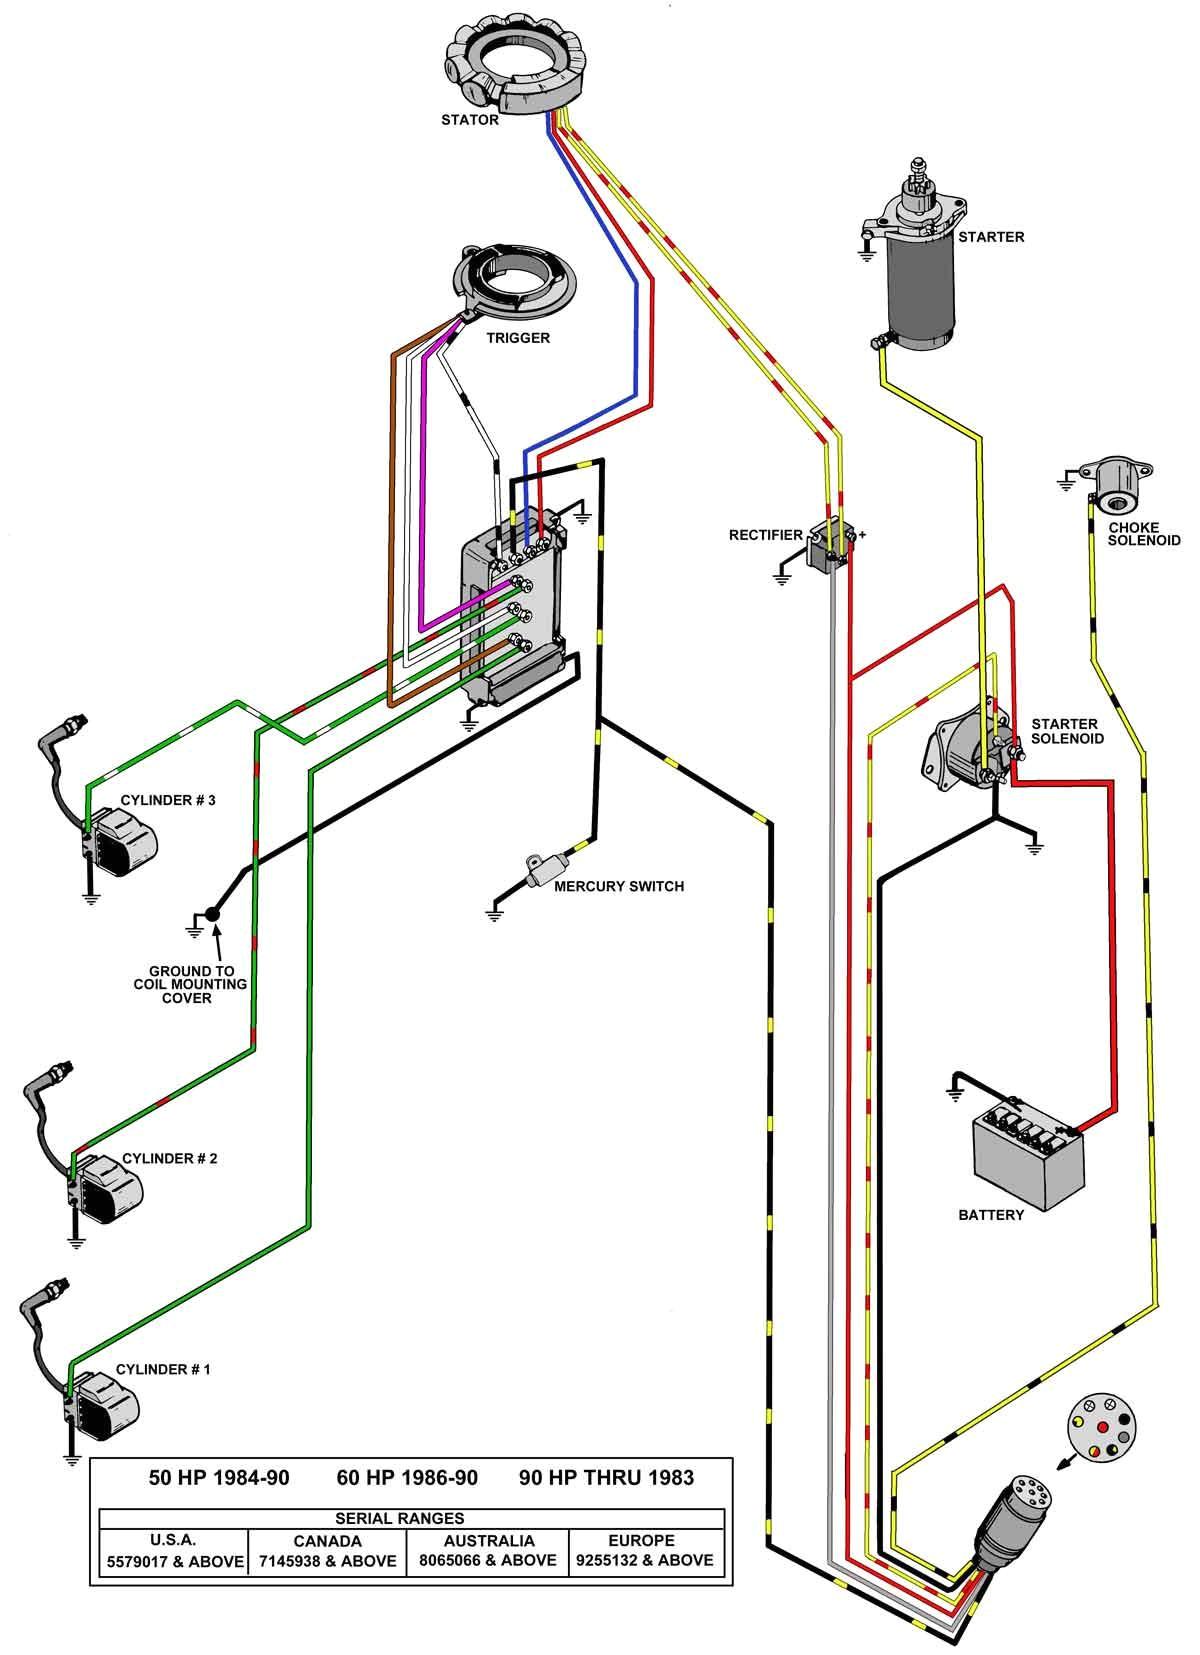 115 hp mercury outboard wiring diagram wiring diagram db wiring diagram for mercury outboard motor home